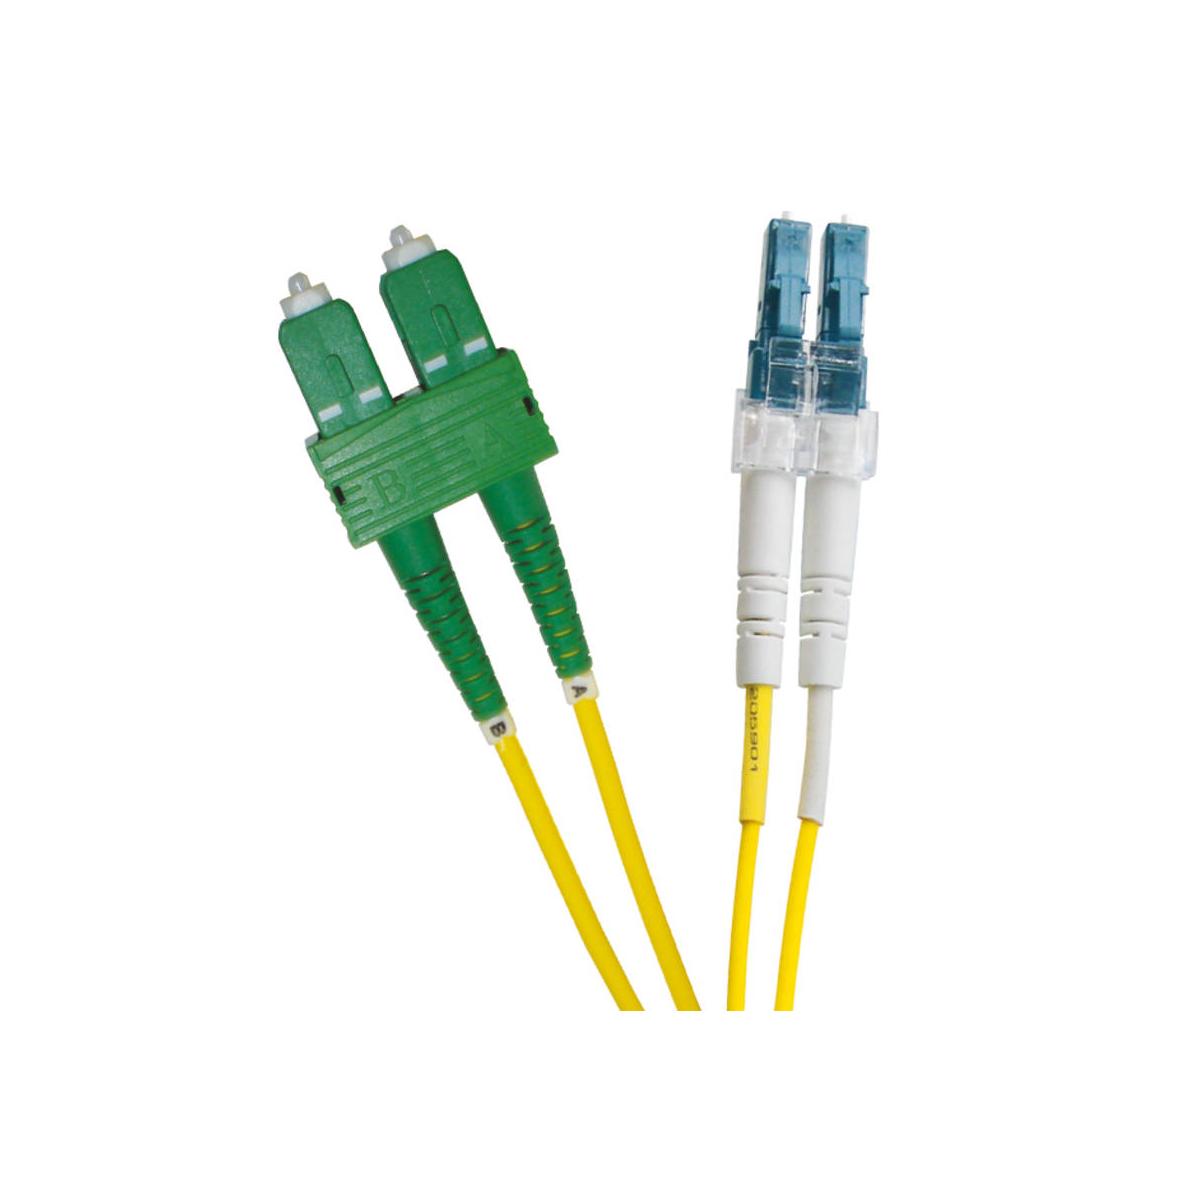 EXCEL OS2 2M LC-SCAPC DUPLEX P/LEAD 9/125